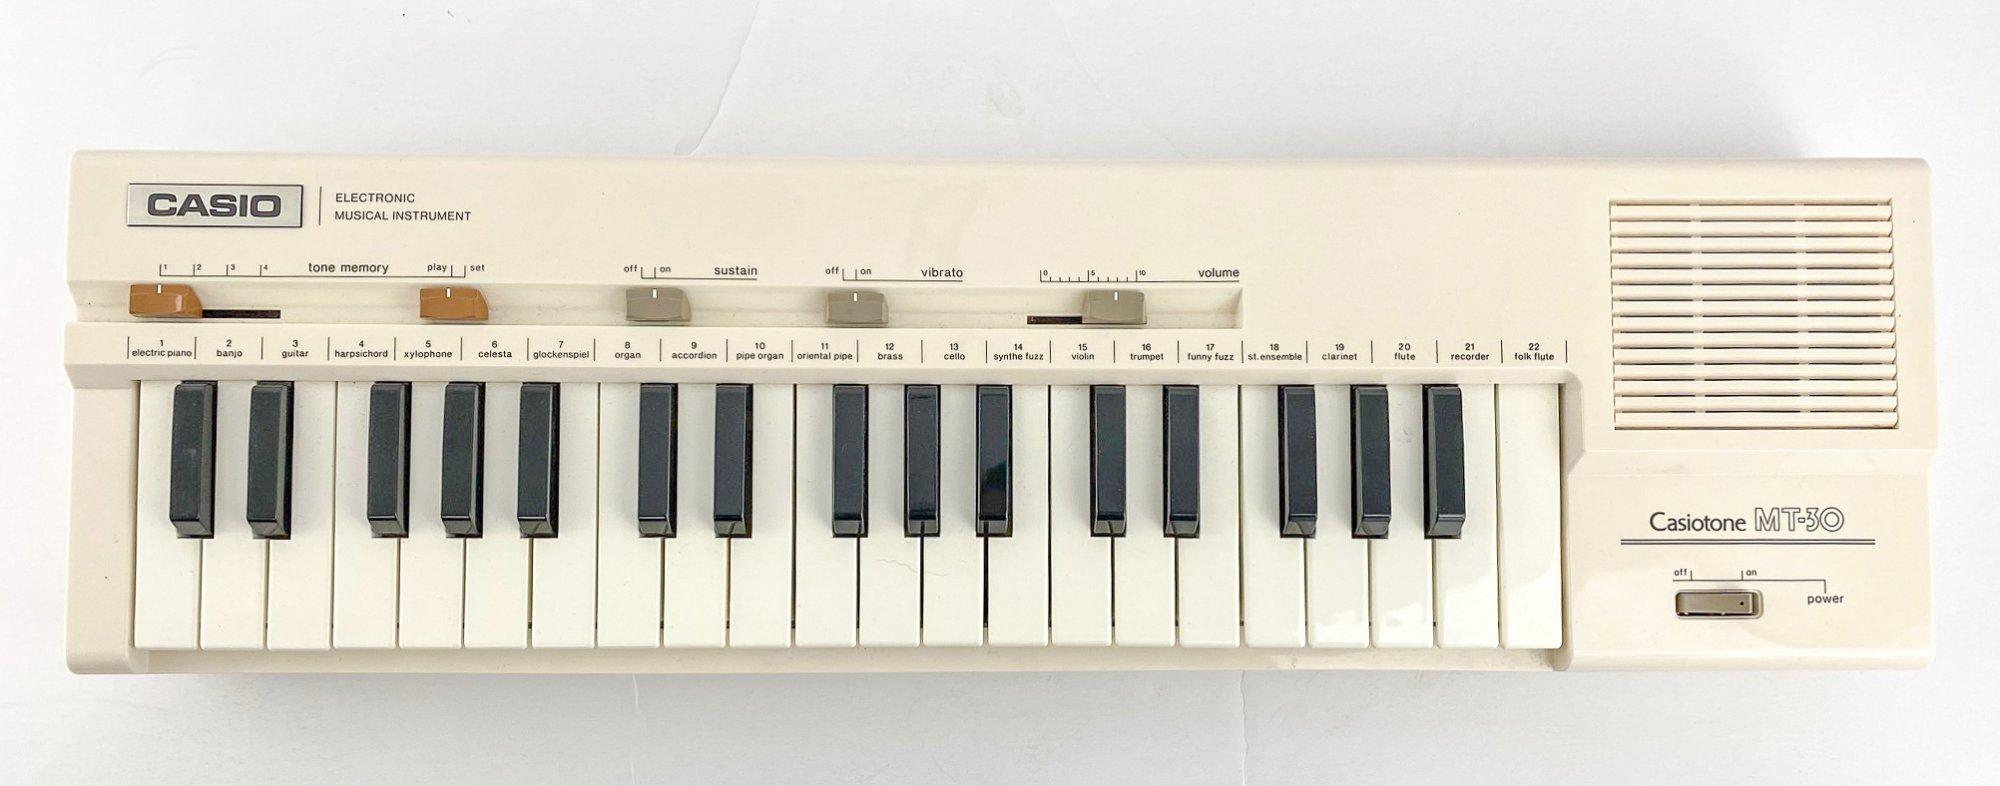 Casio Casiotone MT-30 w/custom case